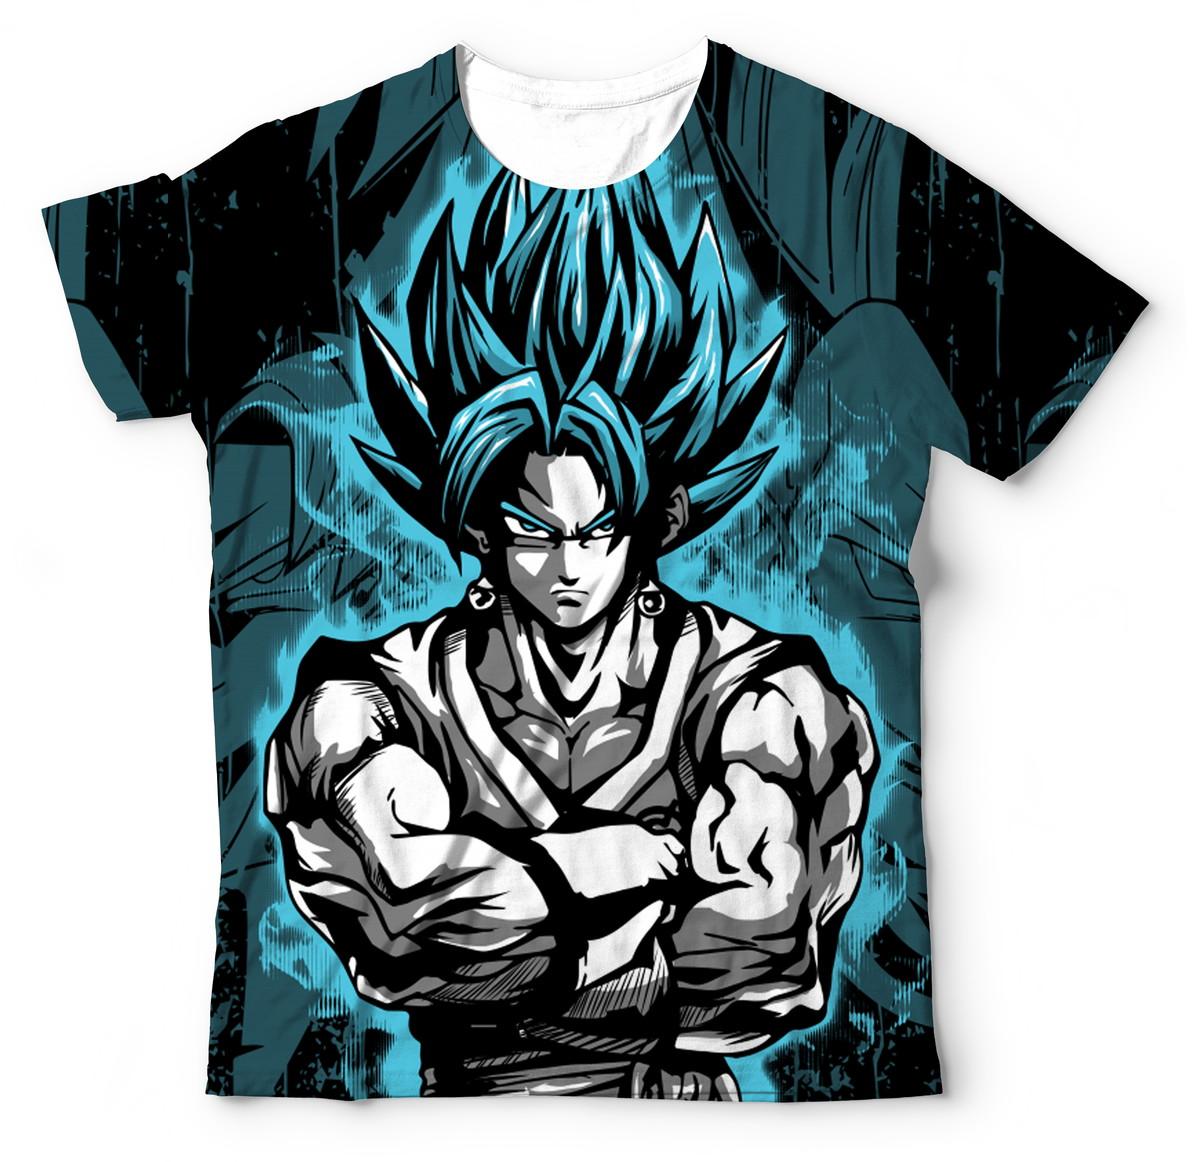 d6fe45c99a Camisa Camiseta Blusa Dragon Ball Super Vegetto Gogeta DBZ no Elo7 ...